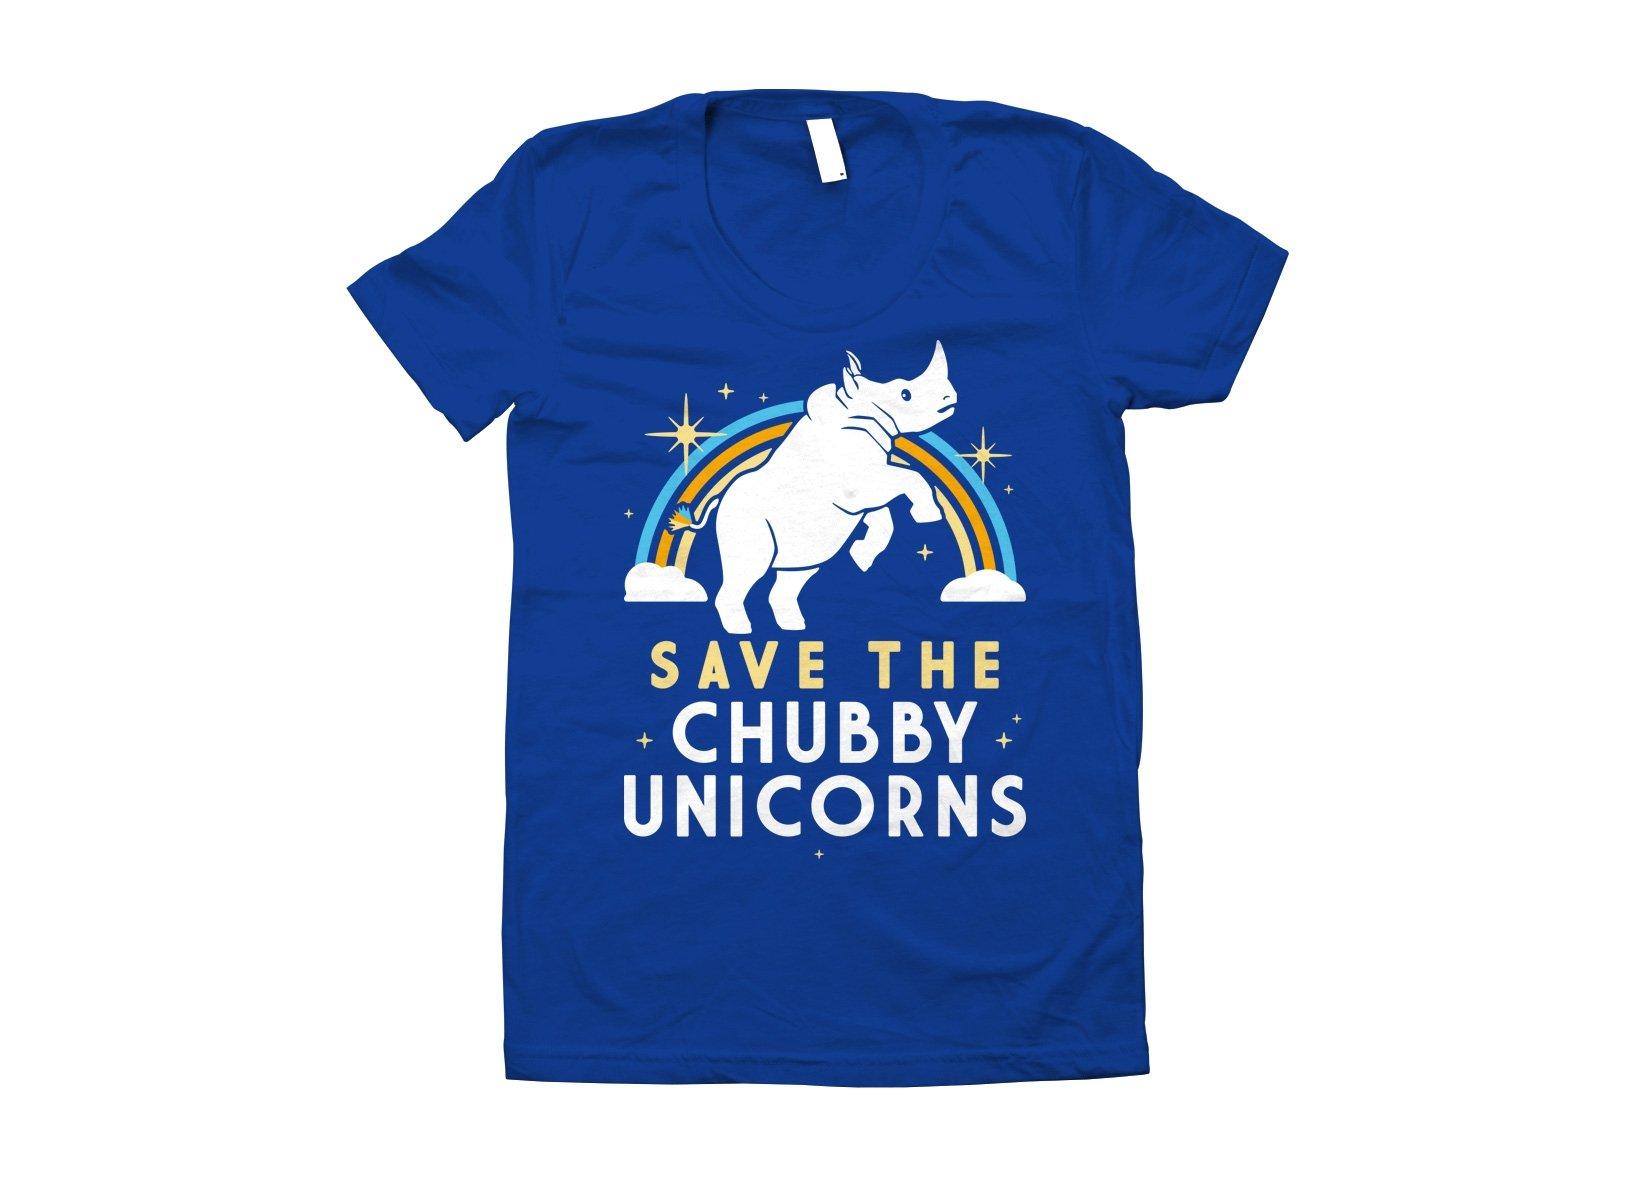 Save The Chubby Unicorns on Juniors T-Shirt